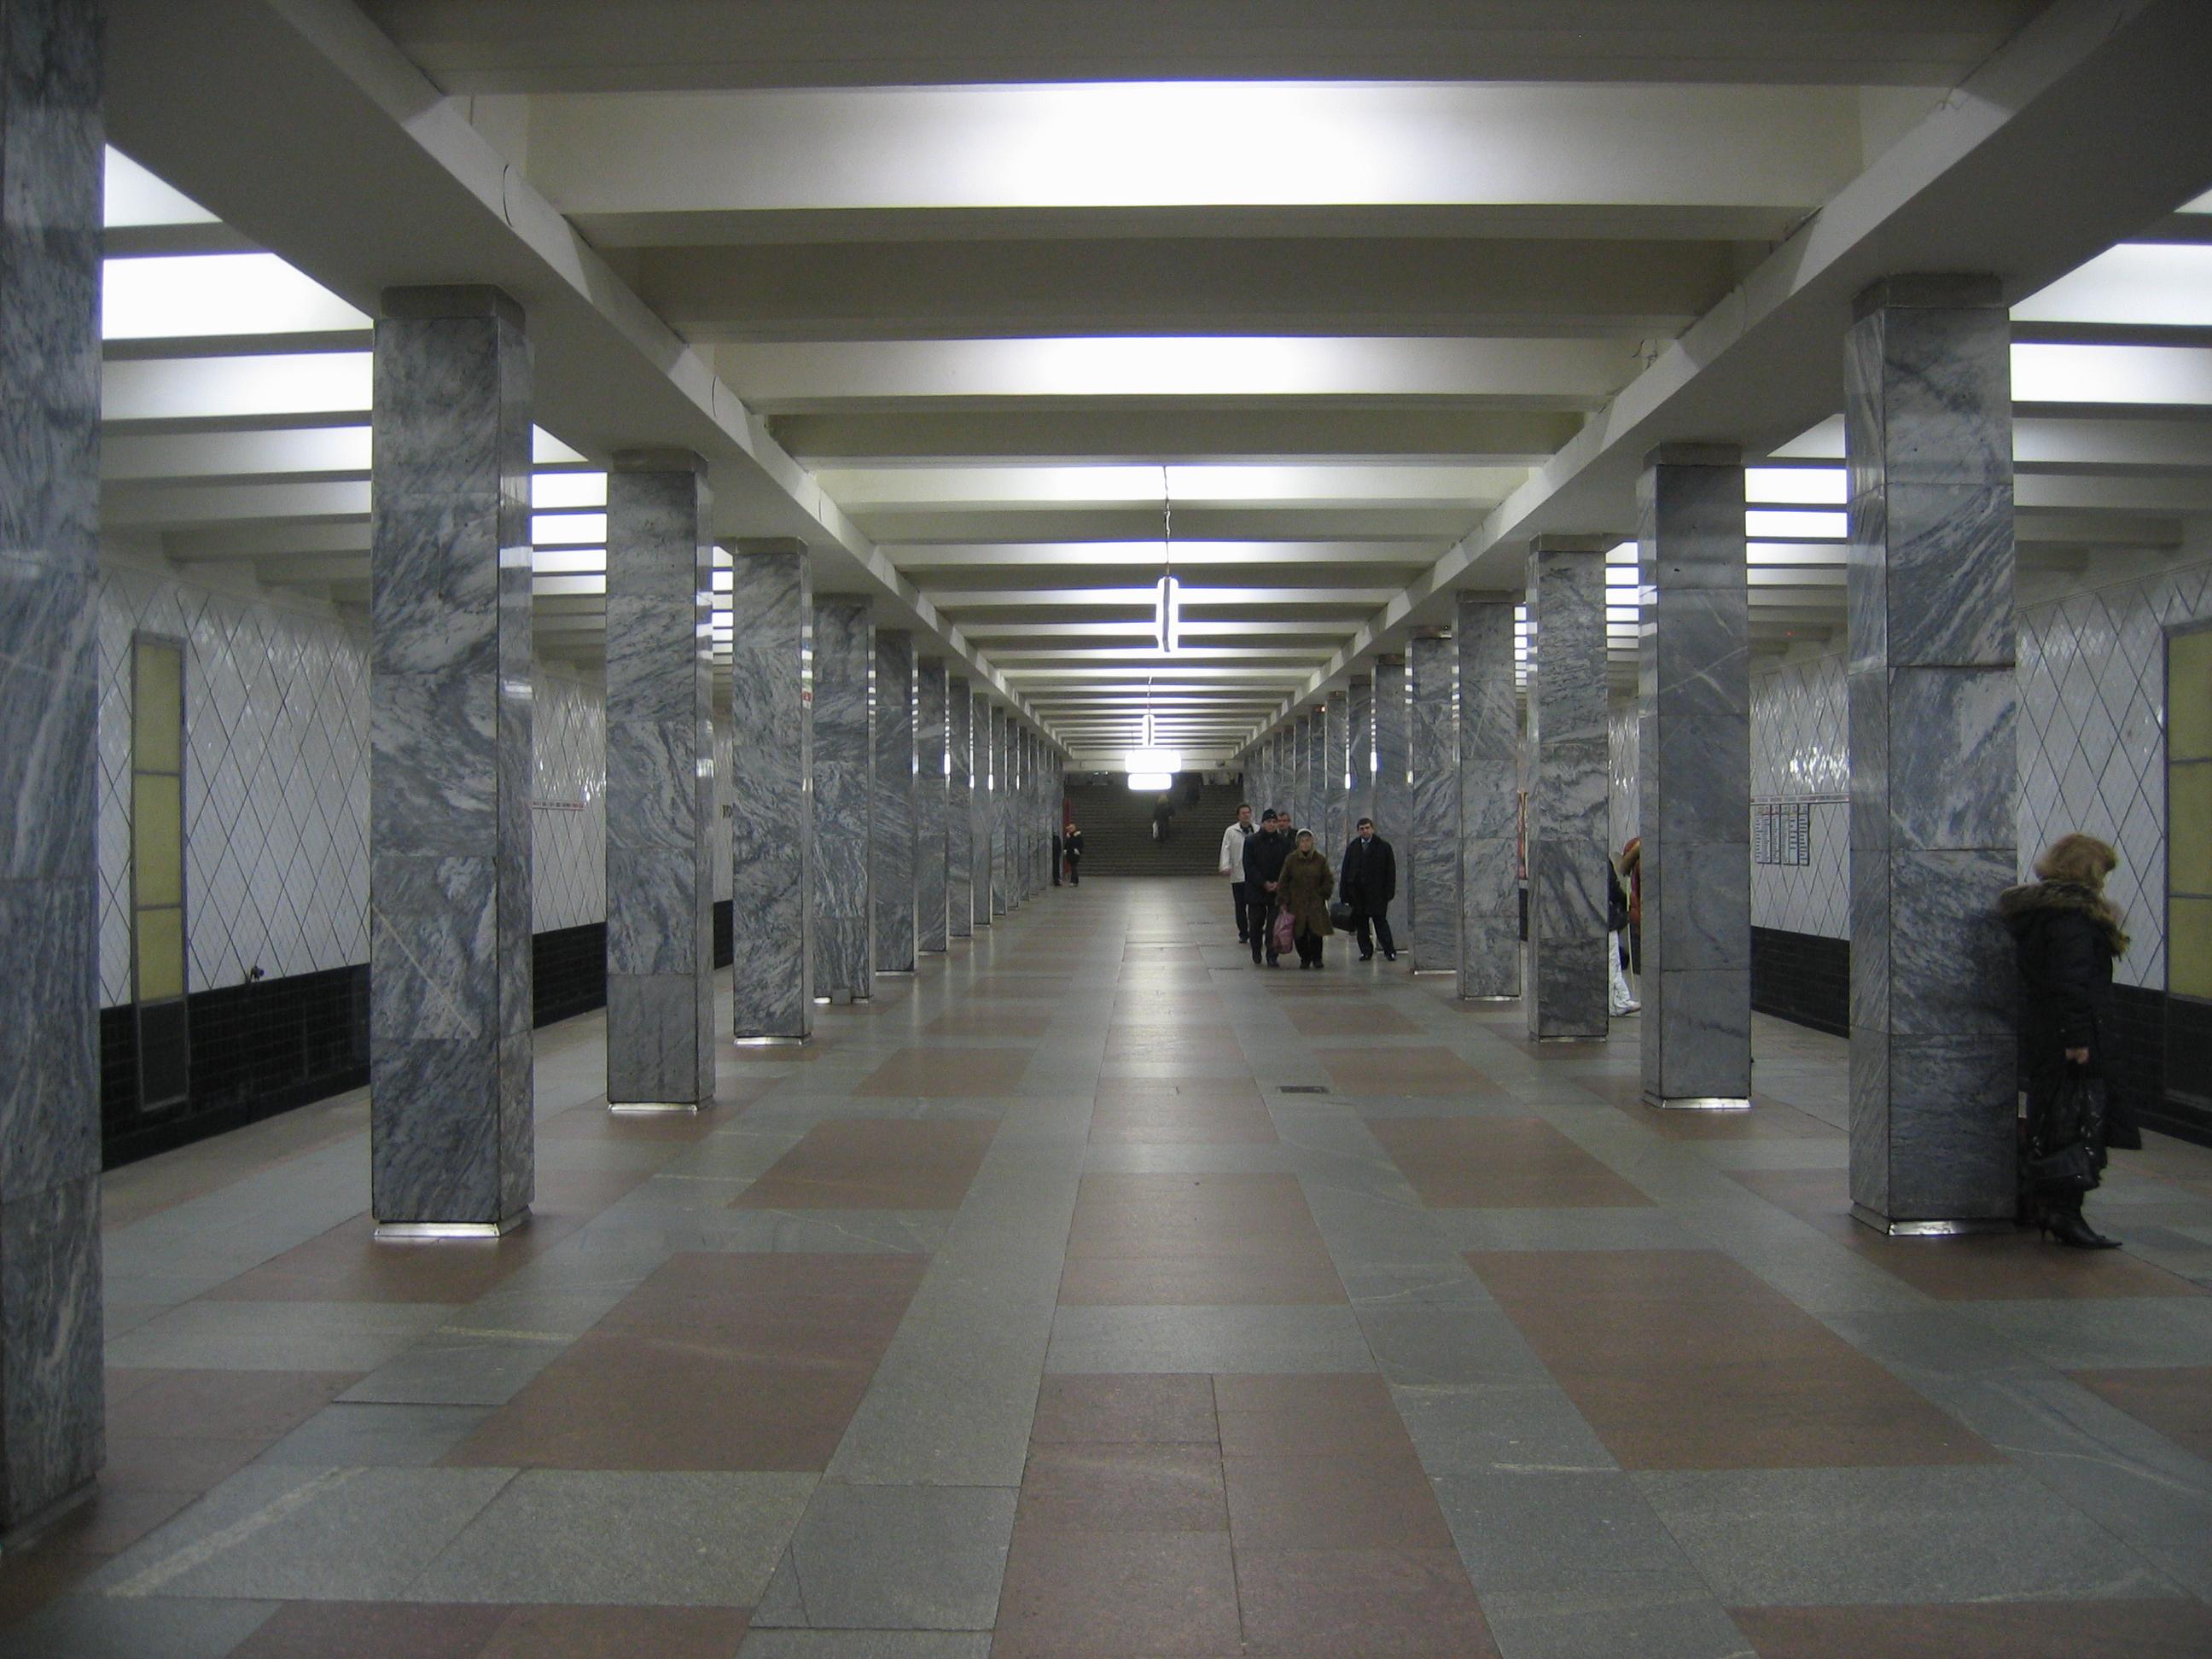 Путаны москвы дешевые метро 25 фотография